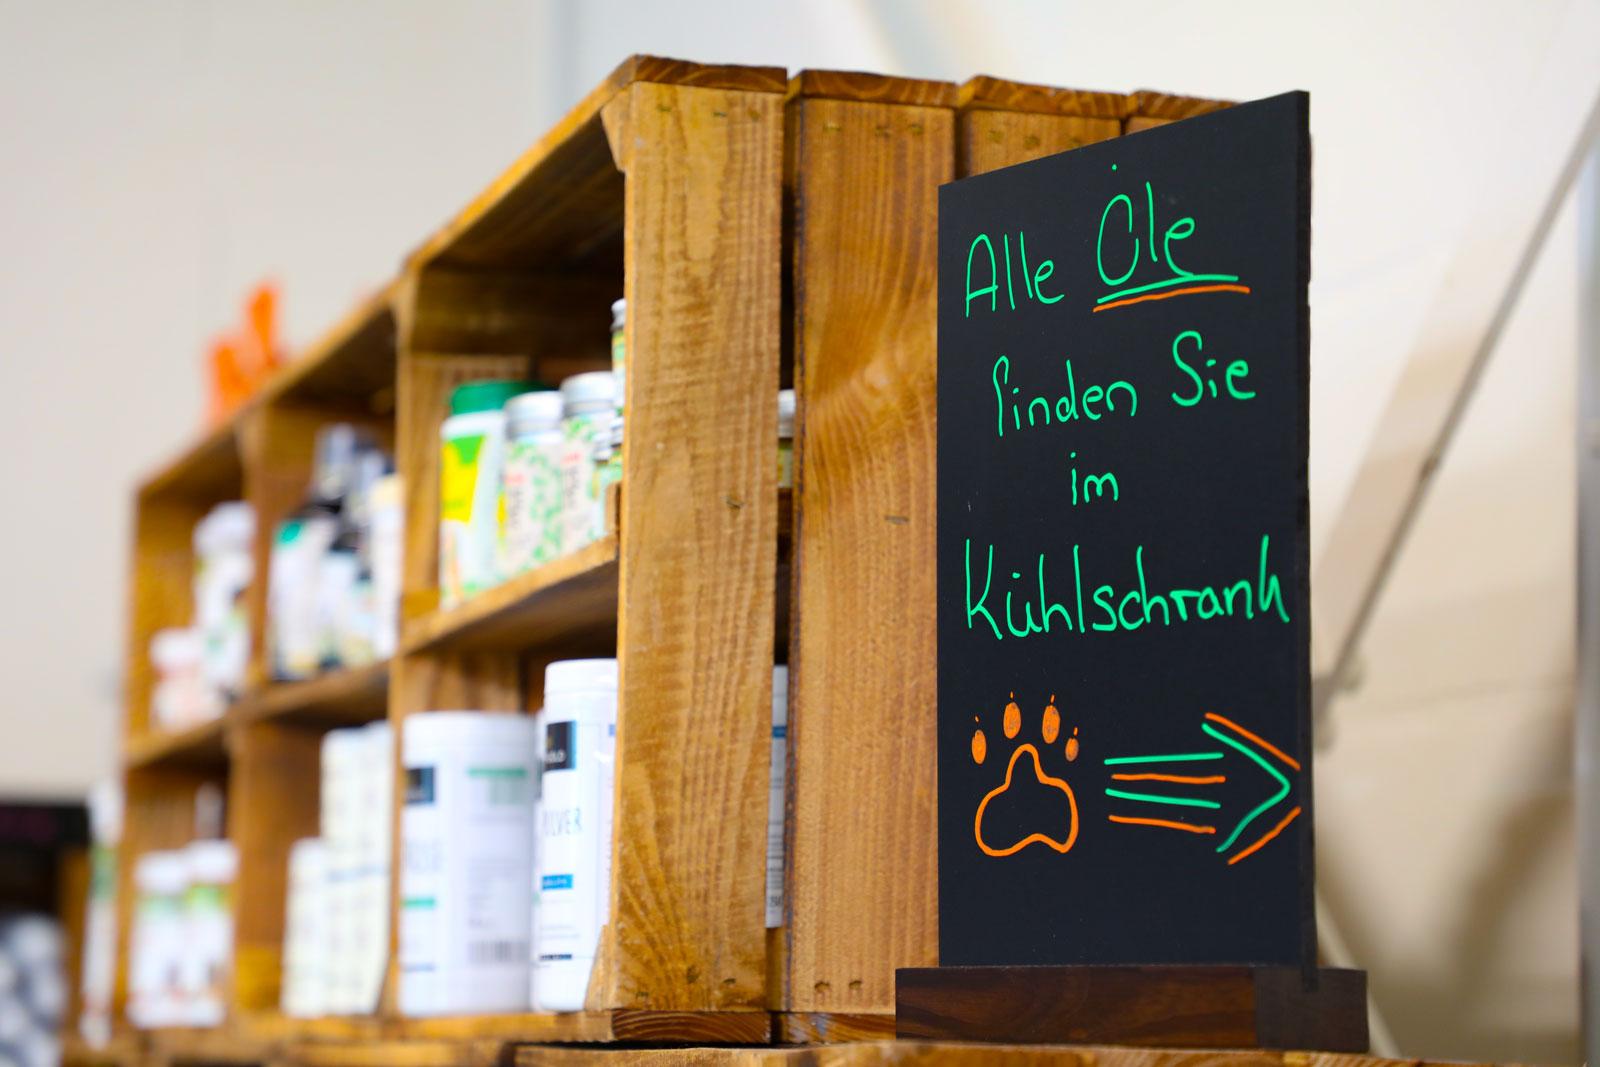 Napf Express • Hundefutter online kaufen • Katzenfutter • Napf Express Lippstadt • Paderborn • Gütersloh • Laden